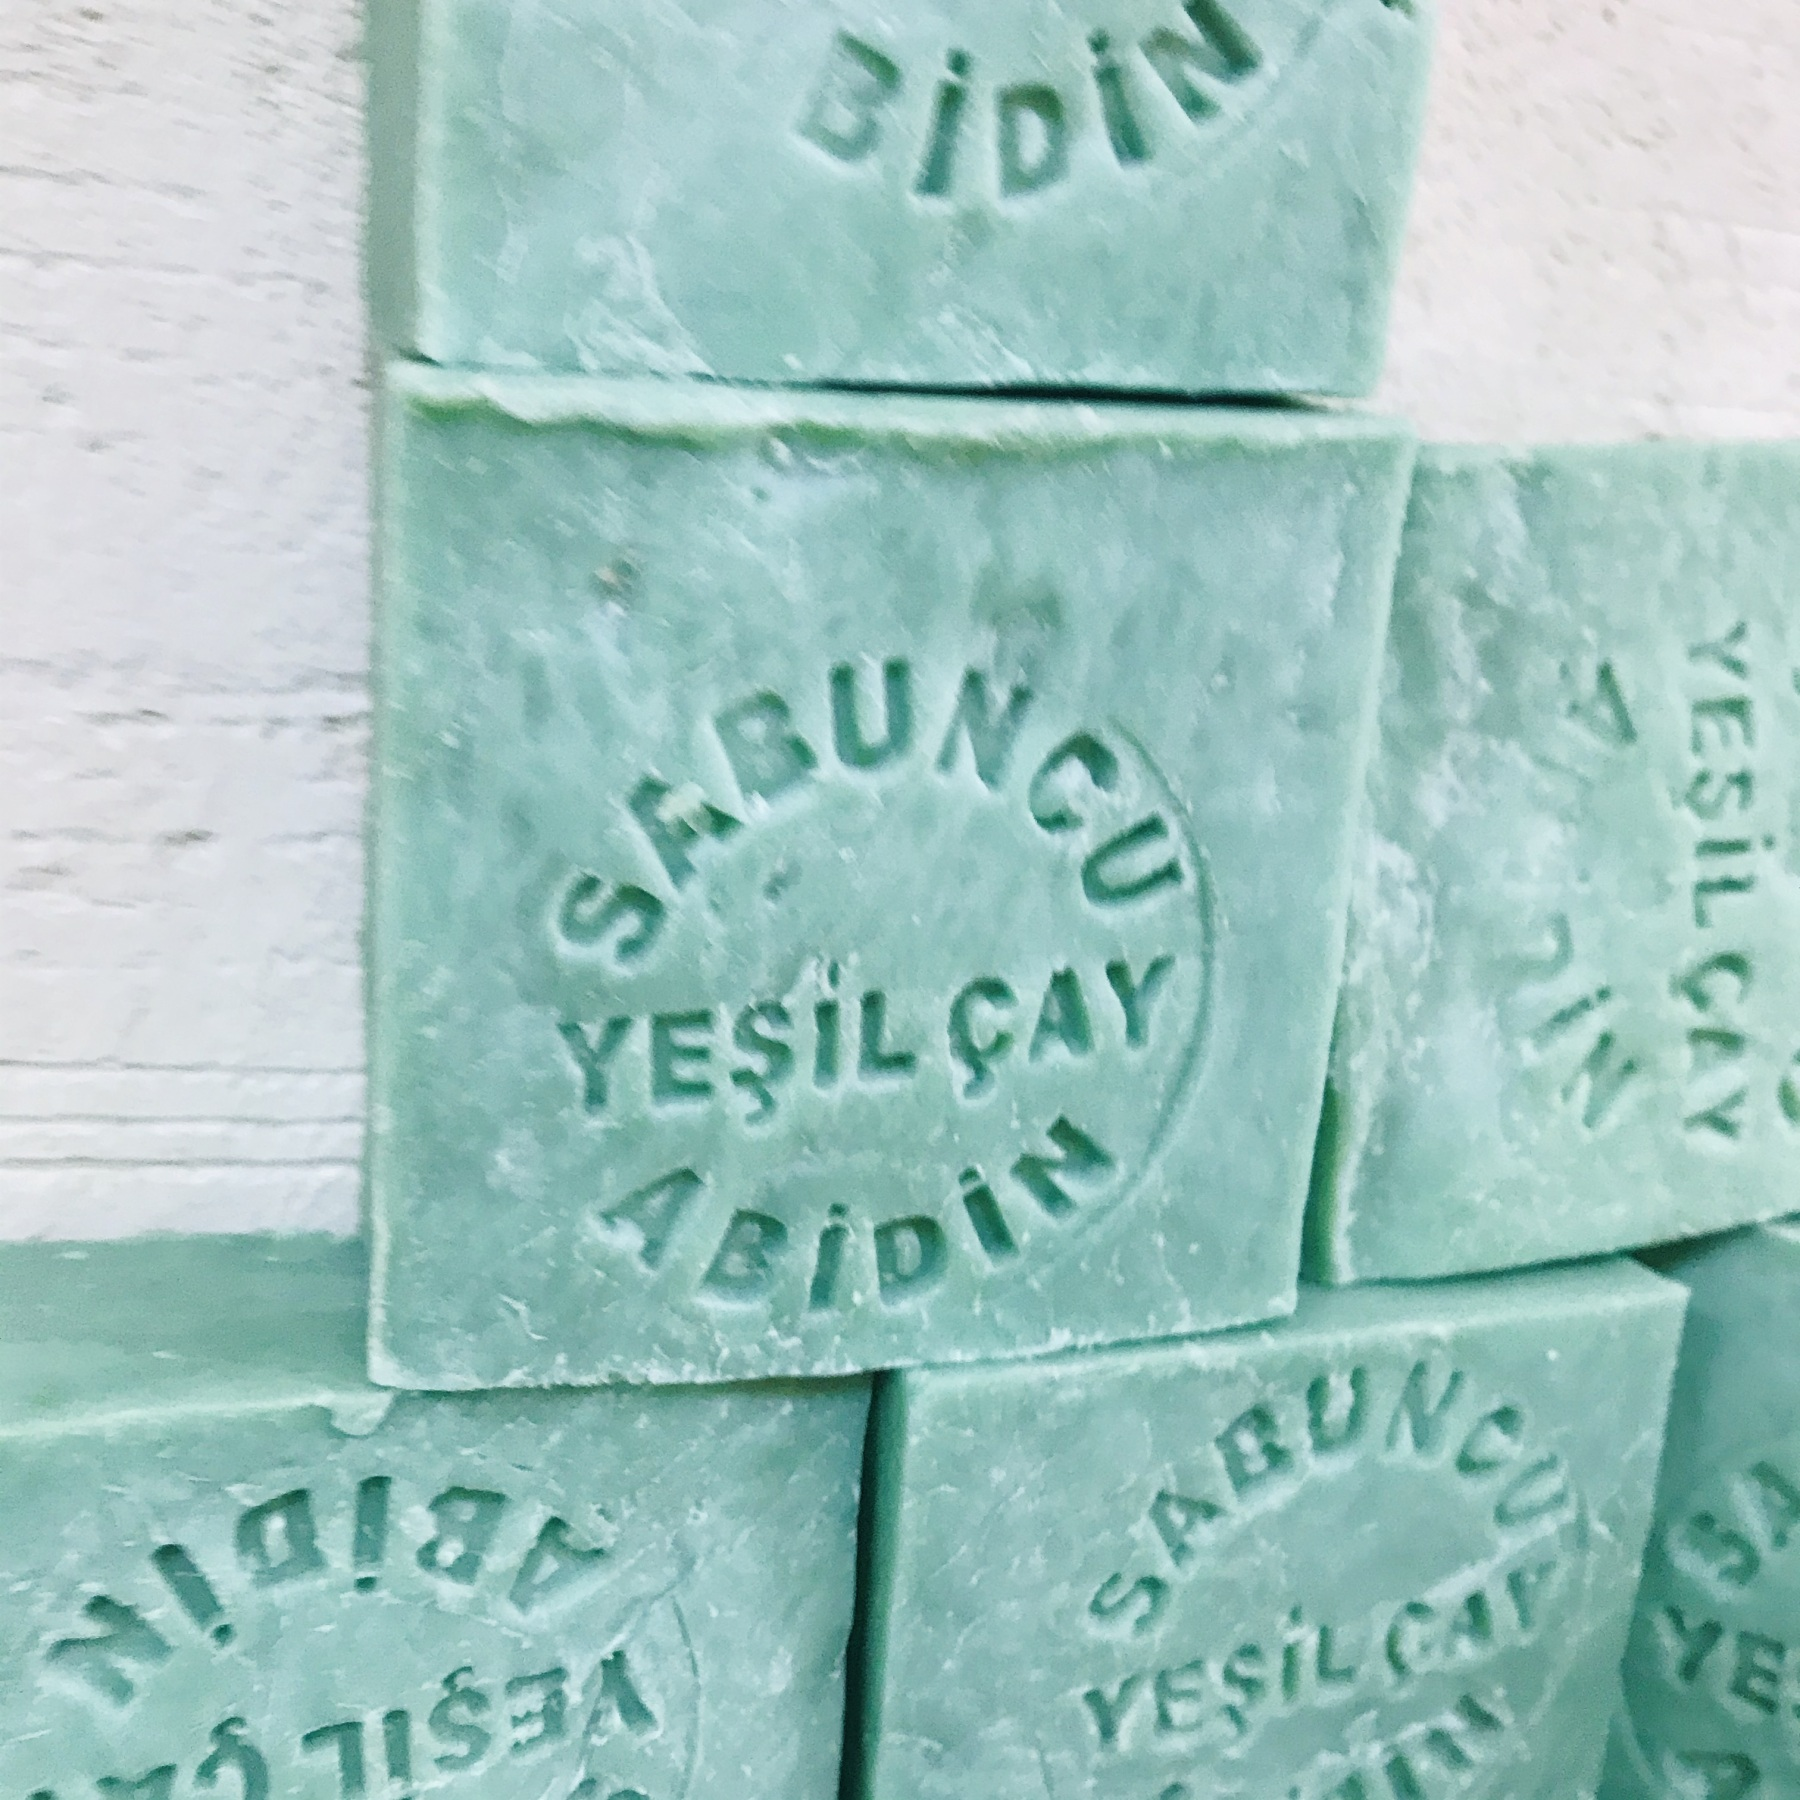 Green Tea Soap 100% Natural Handmade 120g Hair Skin Beauty Whitening Moisturizing Cleaner Antibacterial Acne Treatment